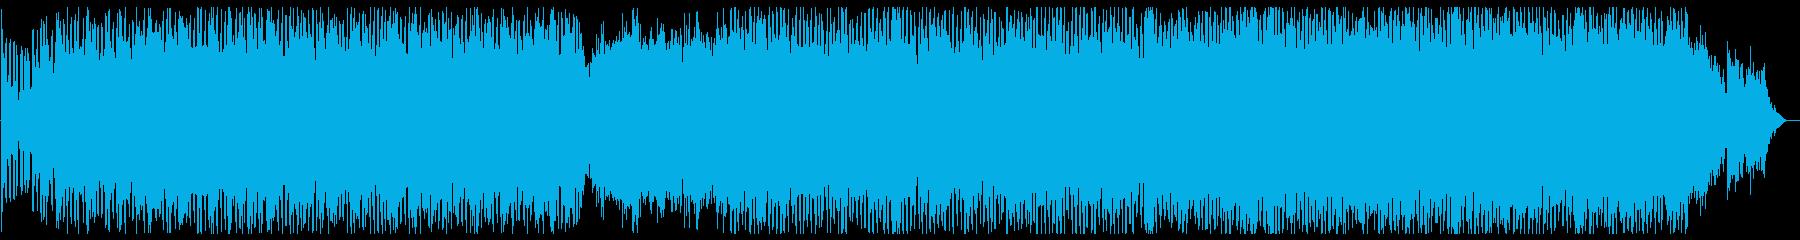 ★SFアニメ★近未来の歓楽街で起こる事件の再生済みの波形